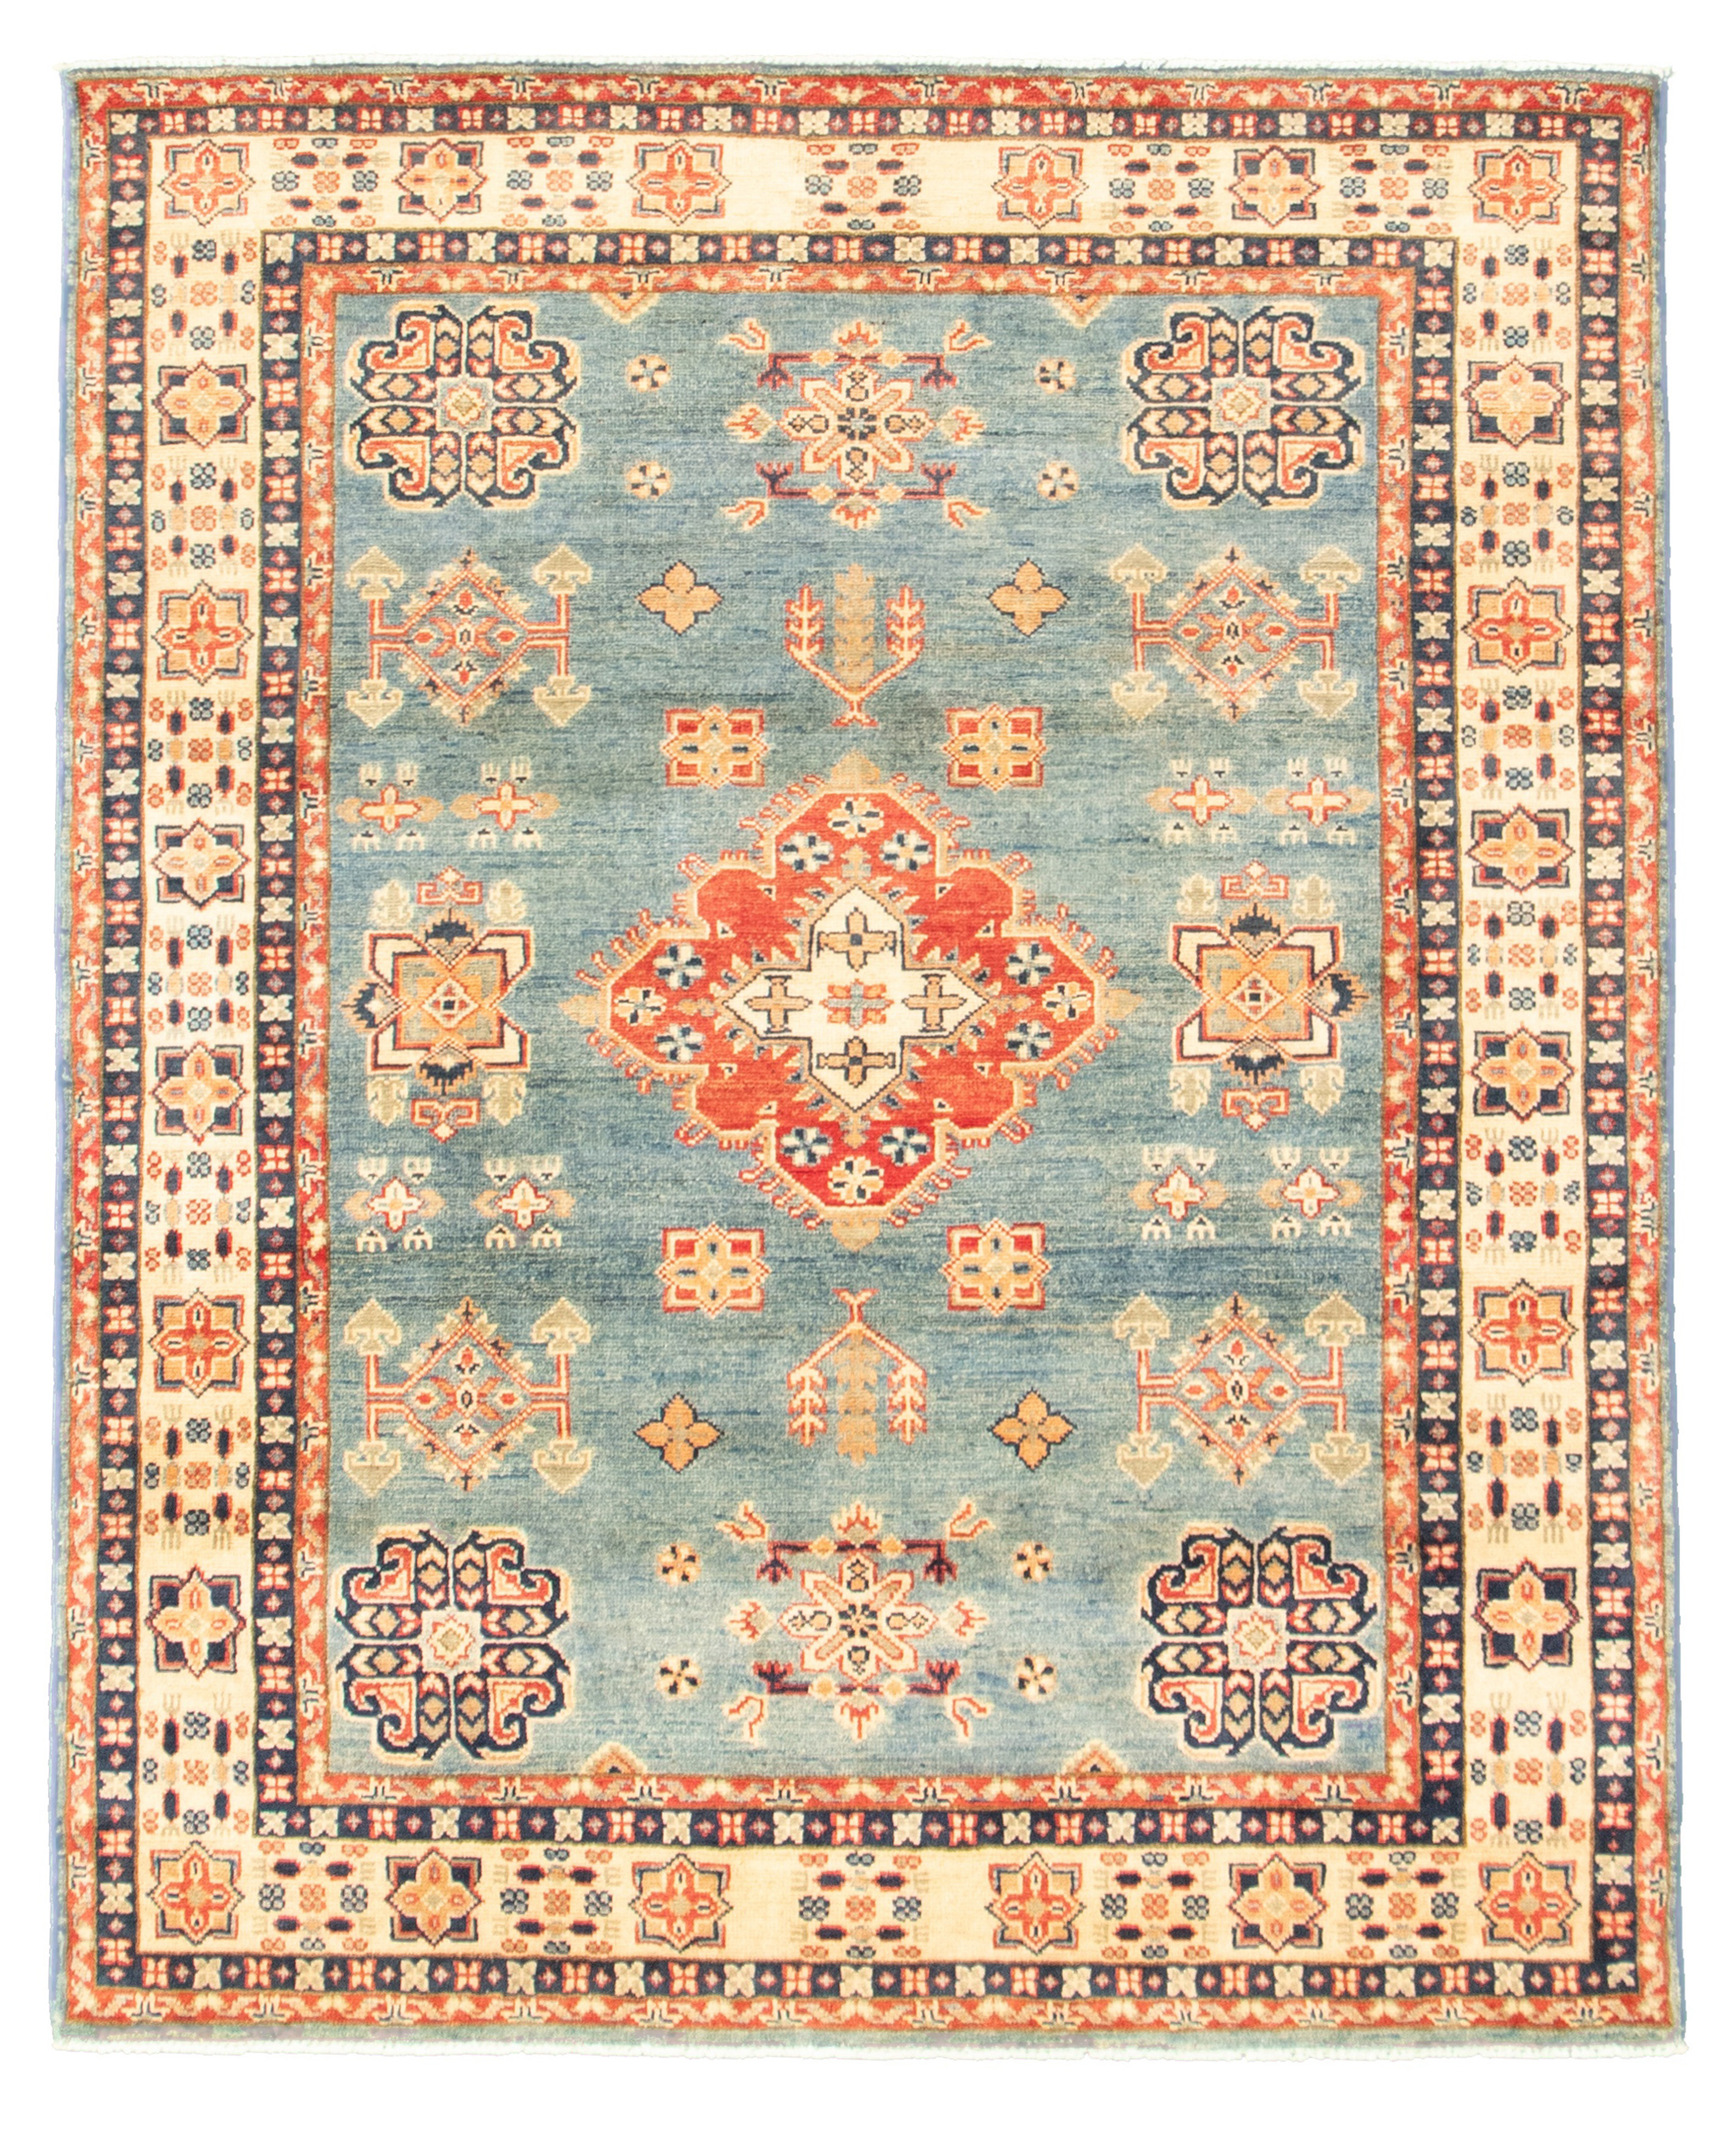 "Hand-knotted Finest Gazni Sky Blue  Rug 4'10"" x 6'2"" Size: 4'10"" x 6'2"""